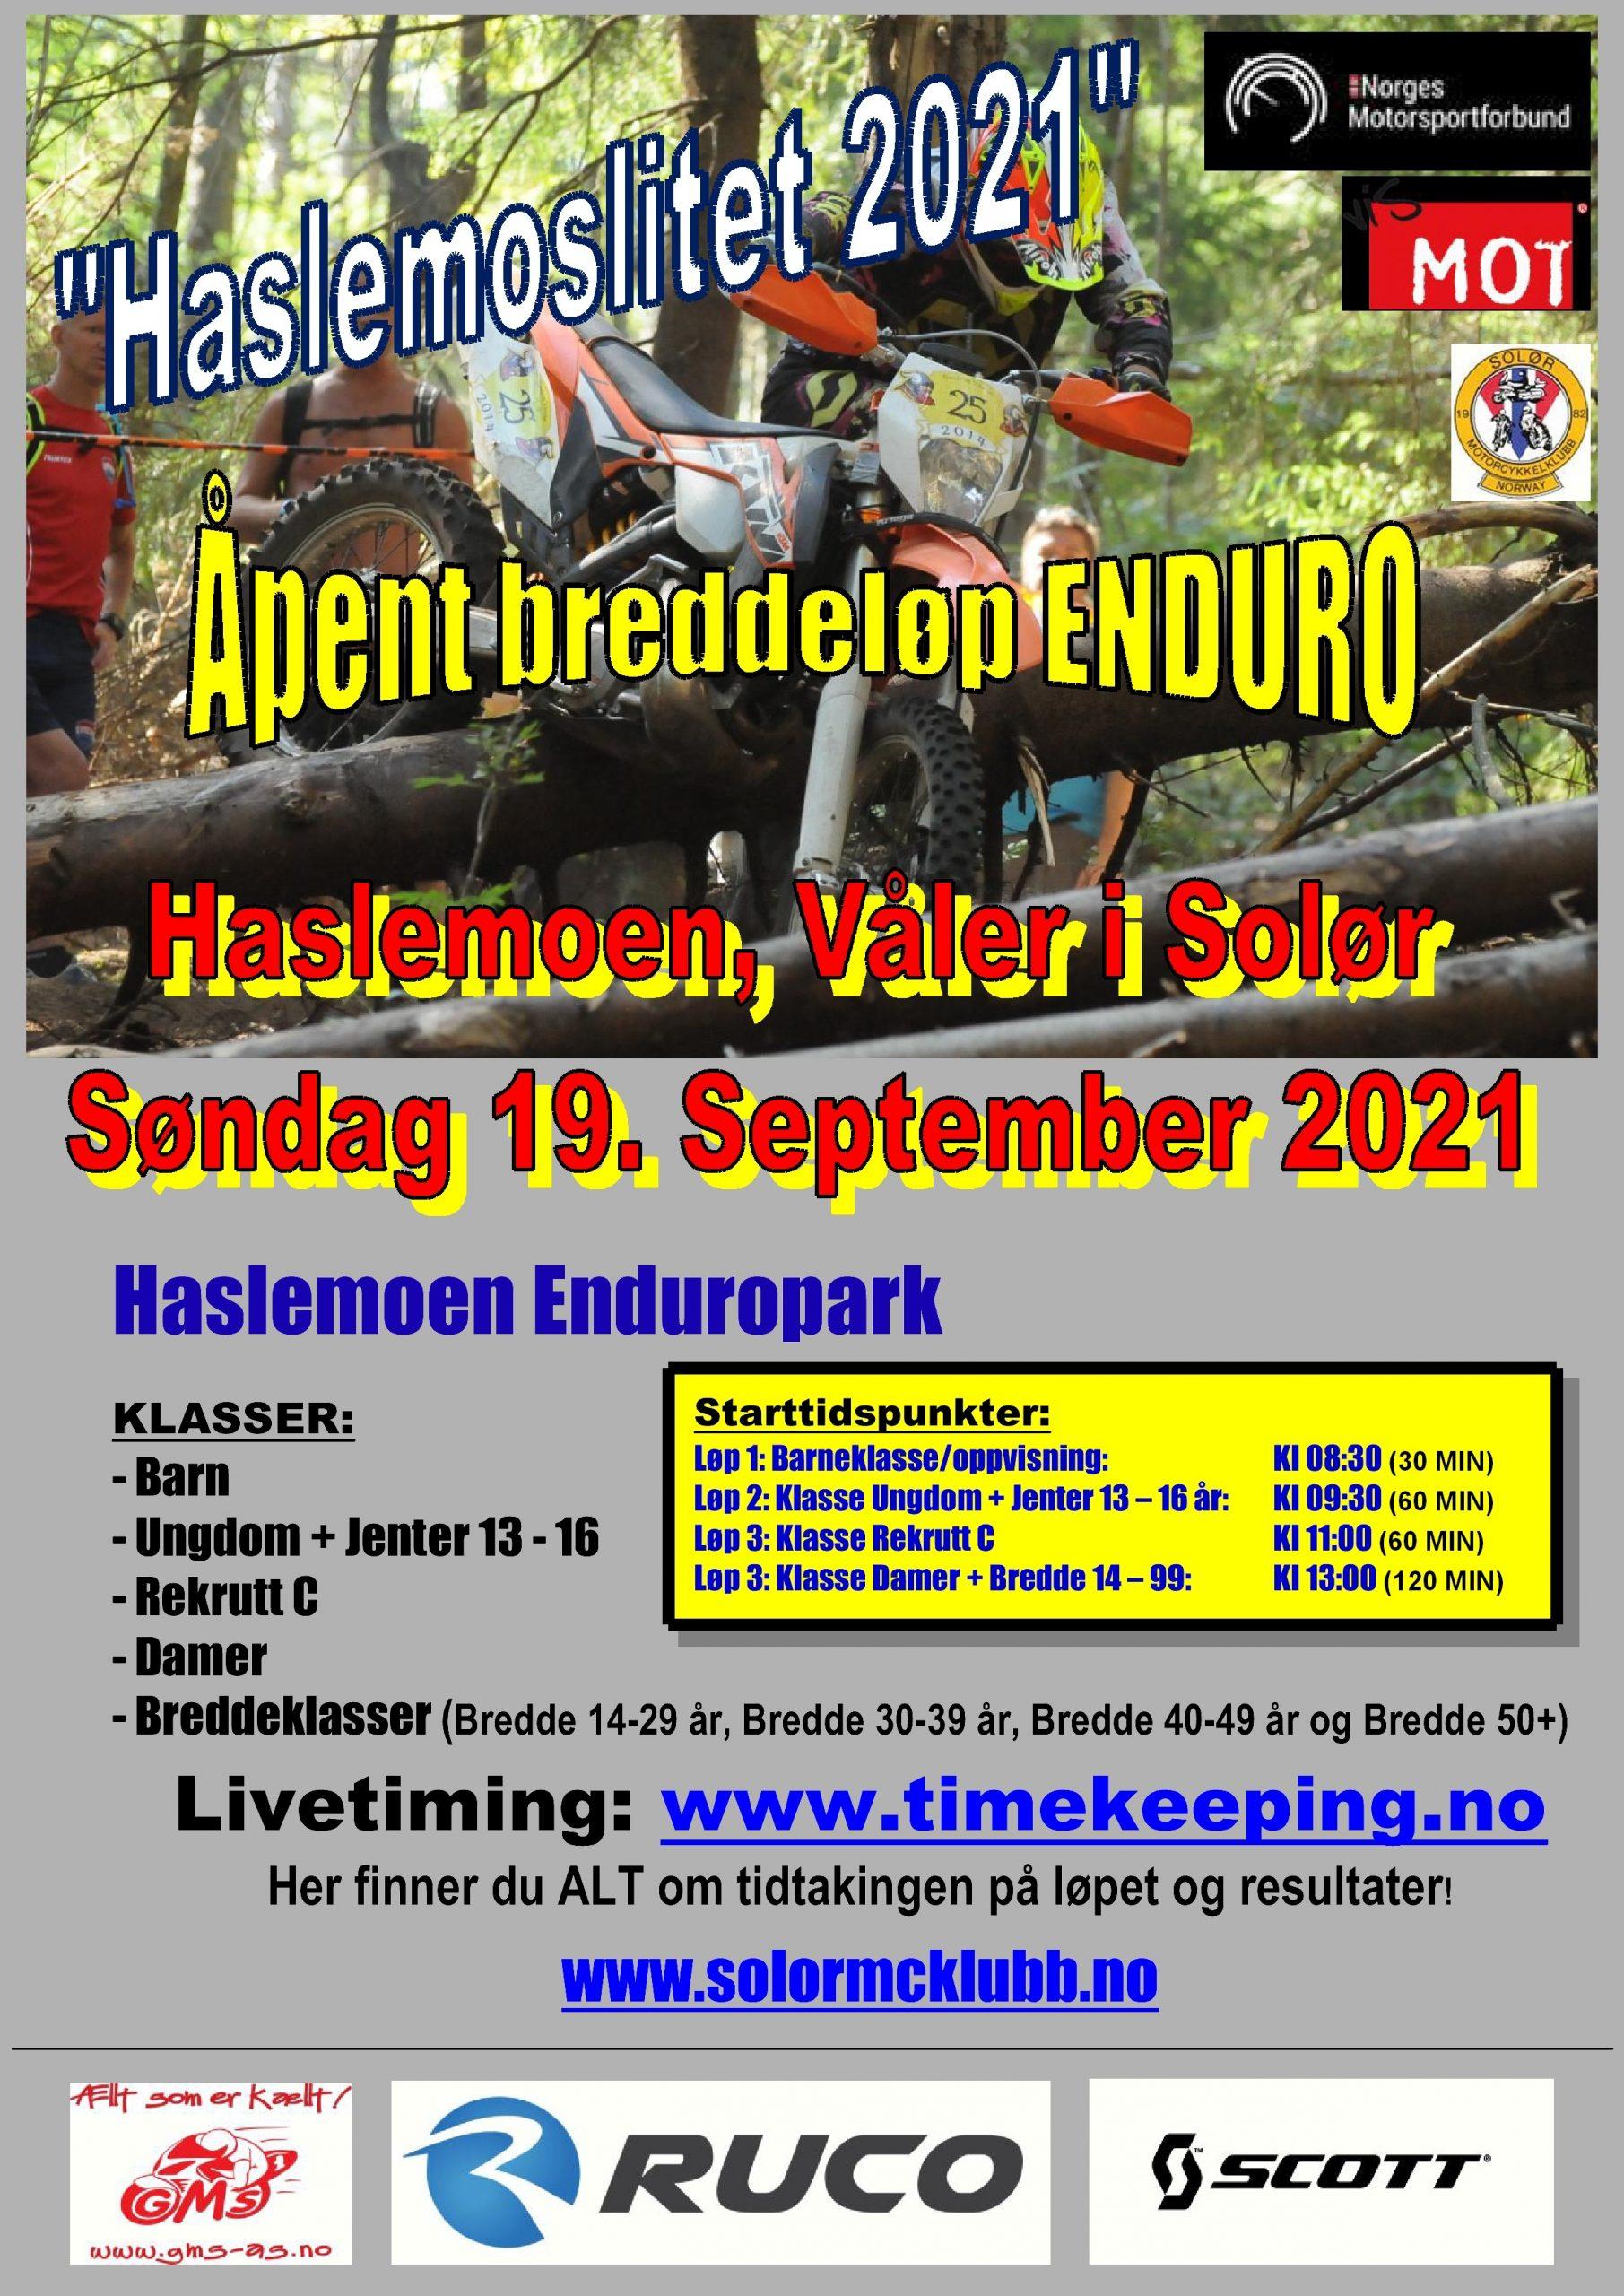 4 - Poster Haslemoslitet 2021 - 19.09.2021